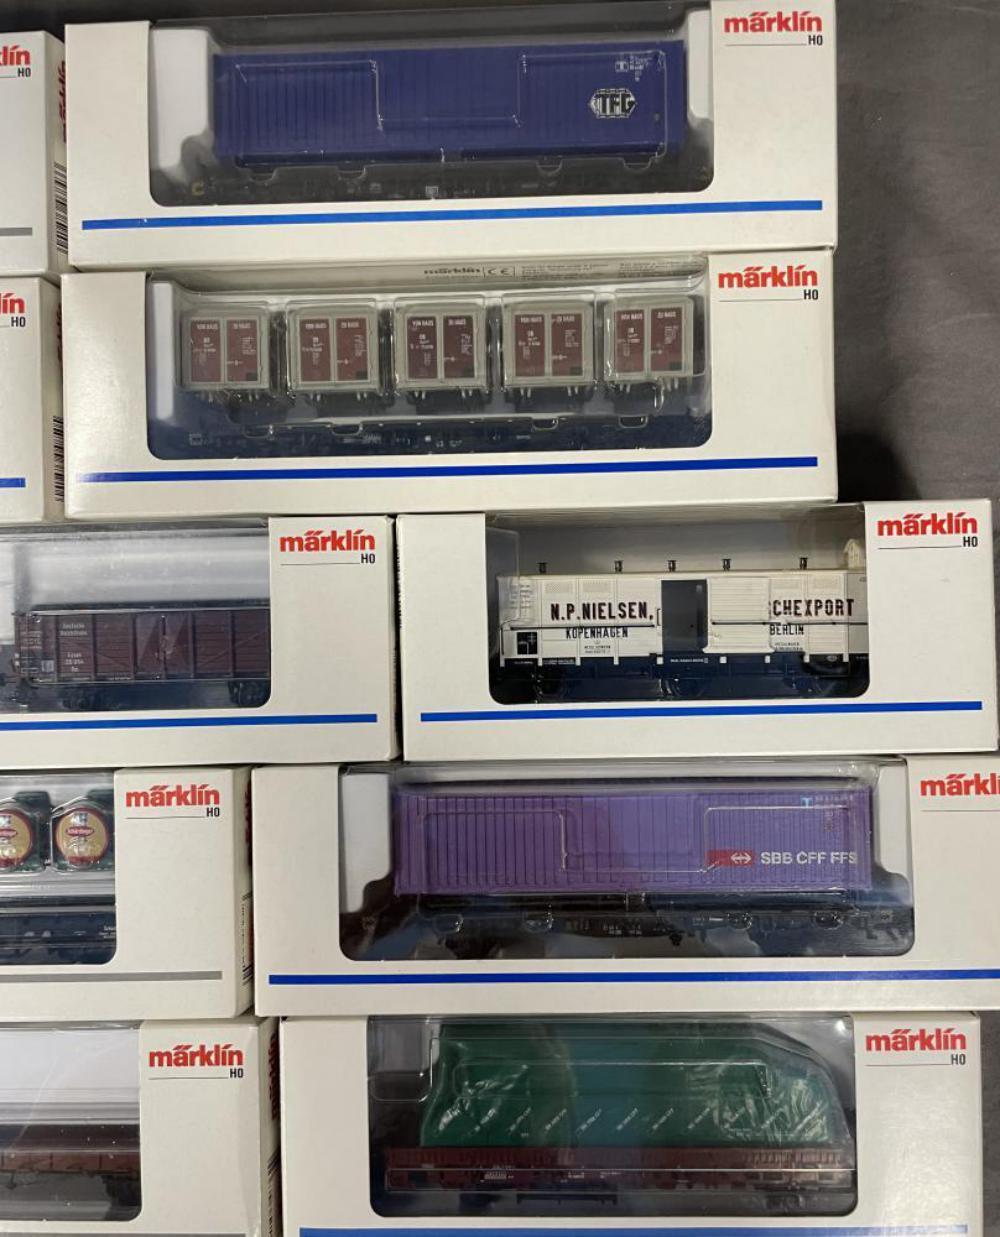 11 Assorted Marklin HO Freight Cars